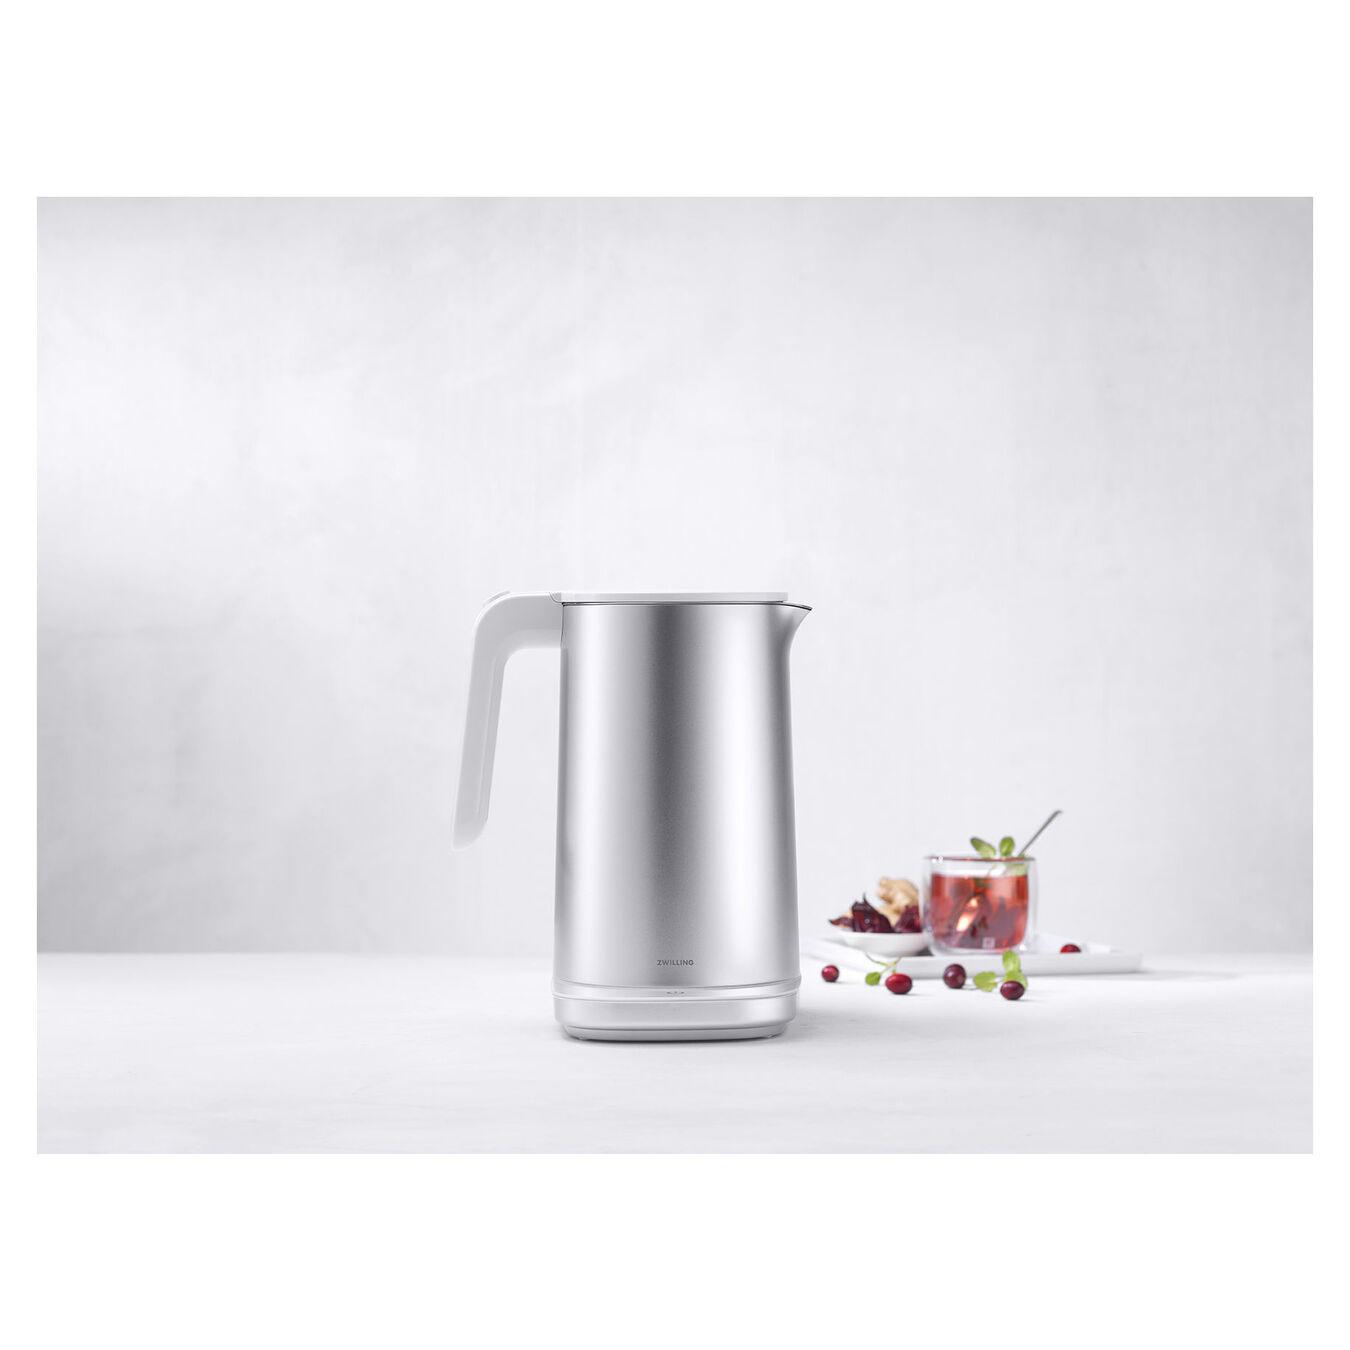 Wasserkocher Pro, 1,5 l, Silber,,large 3